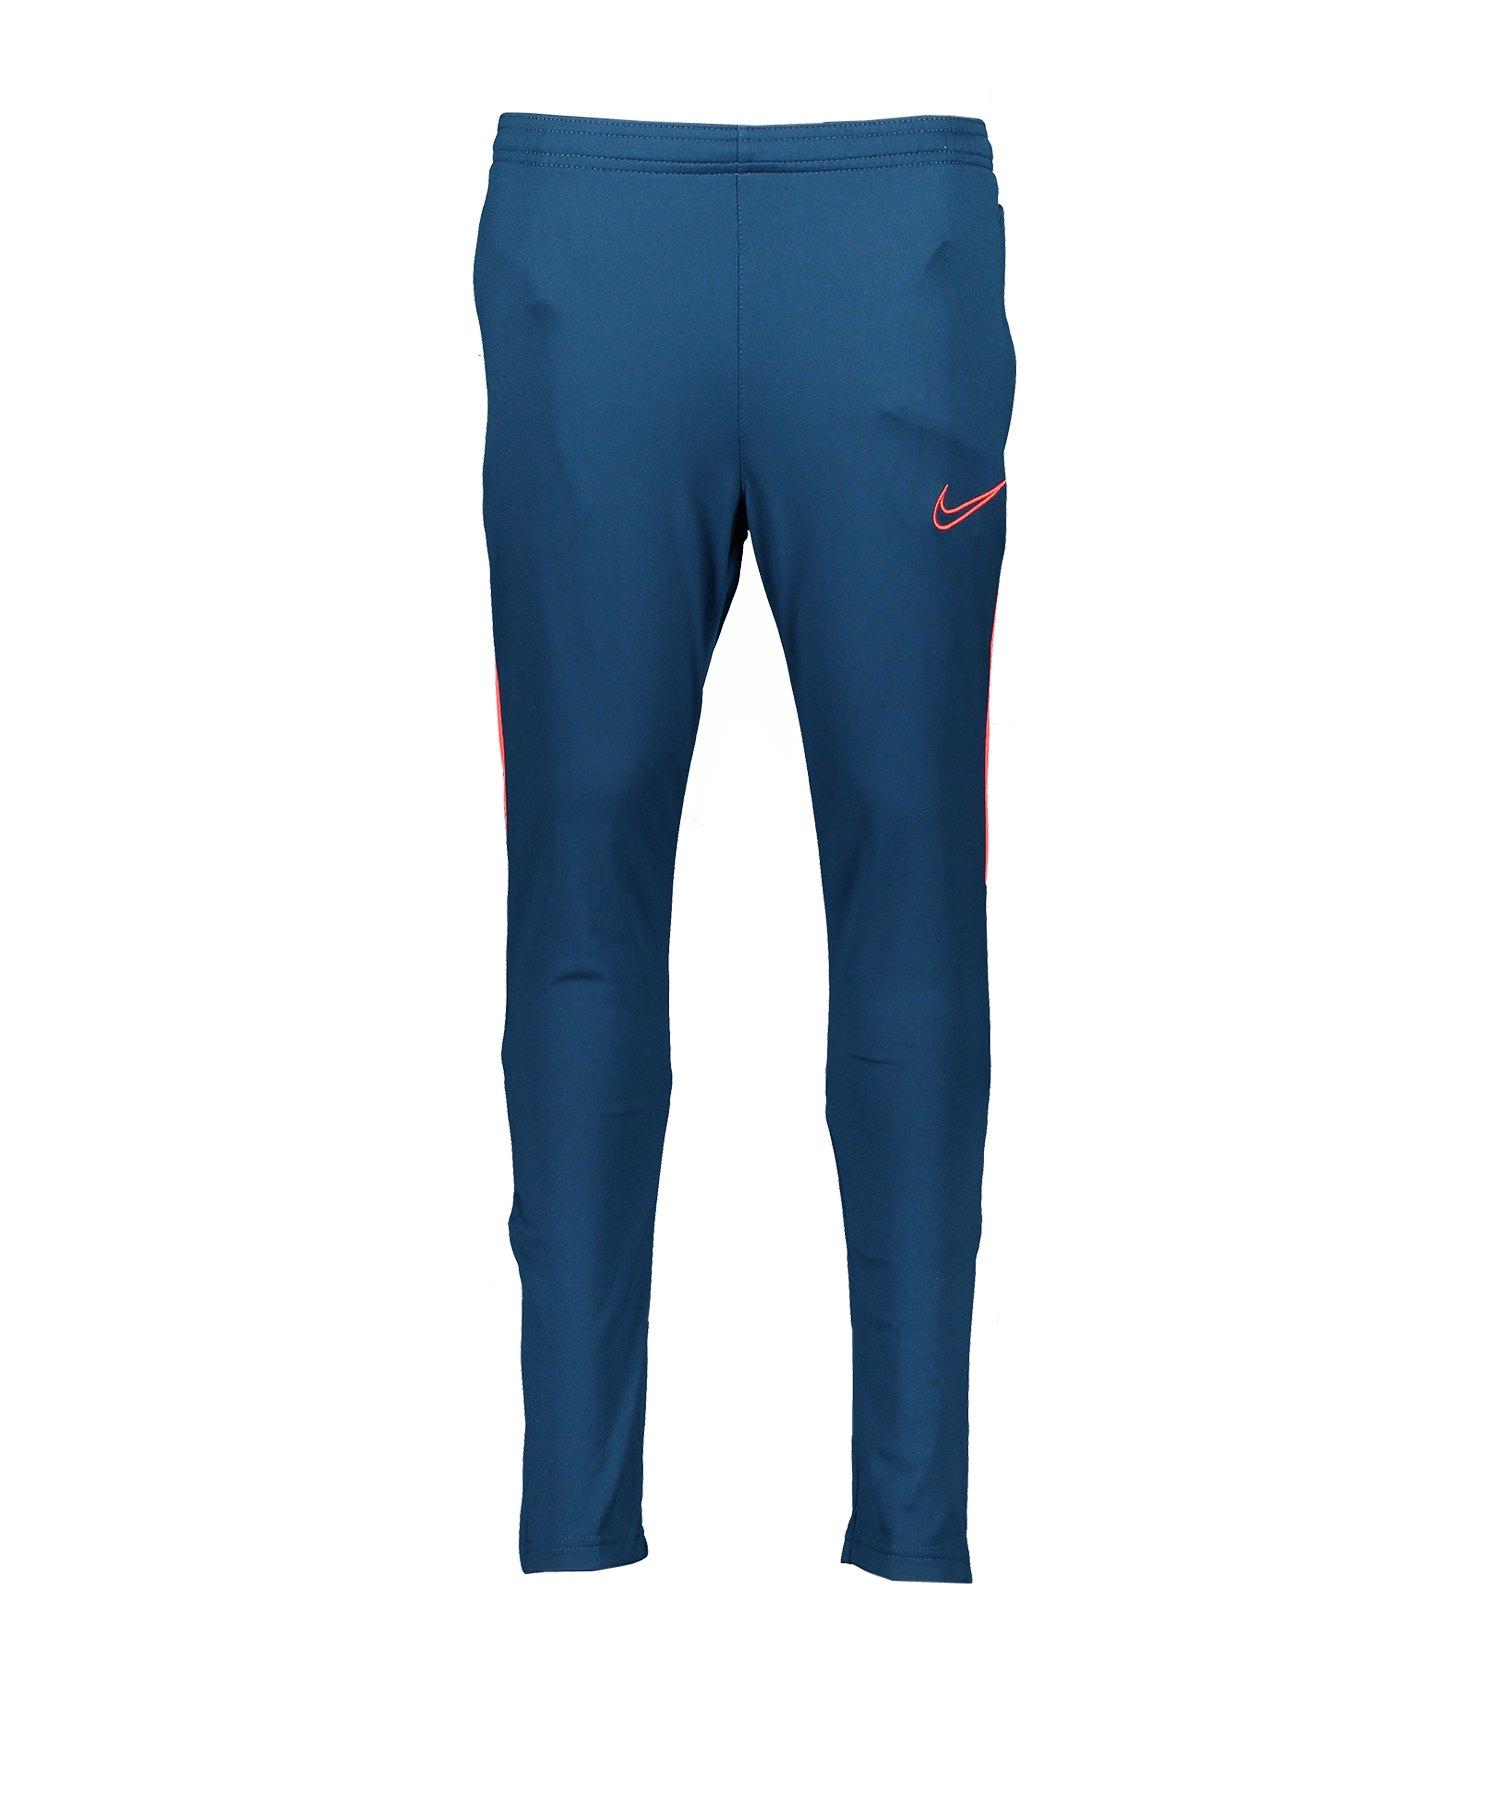 Nike Dry Academy Pant Jogginghose Kids Blau F432 - blau